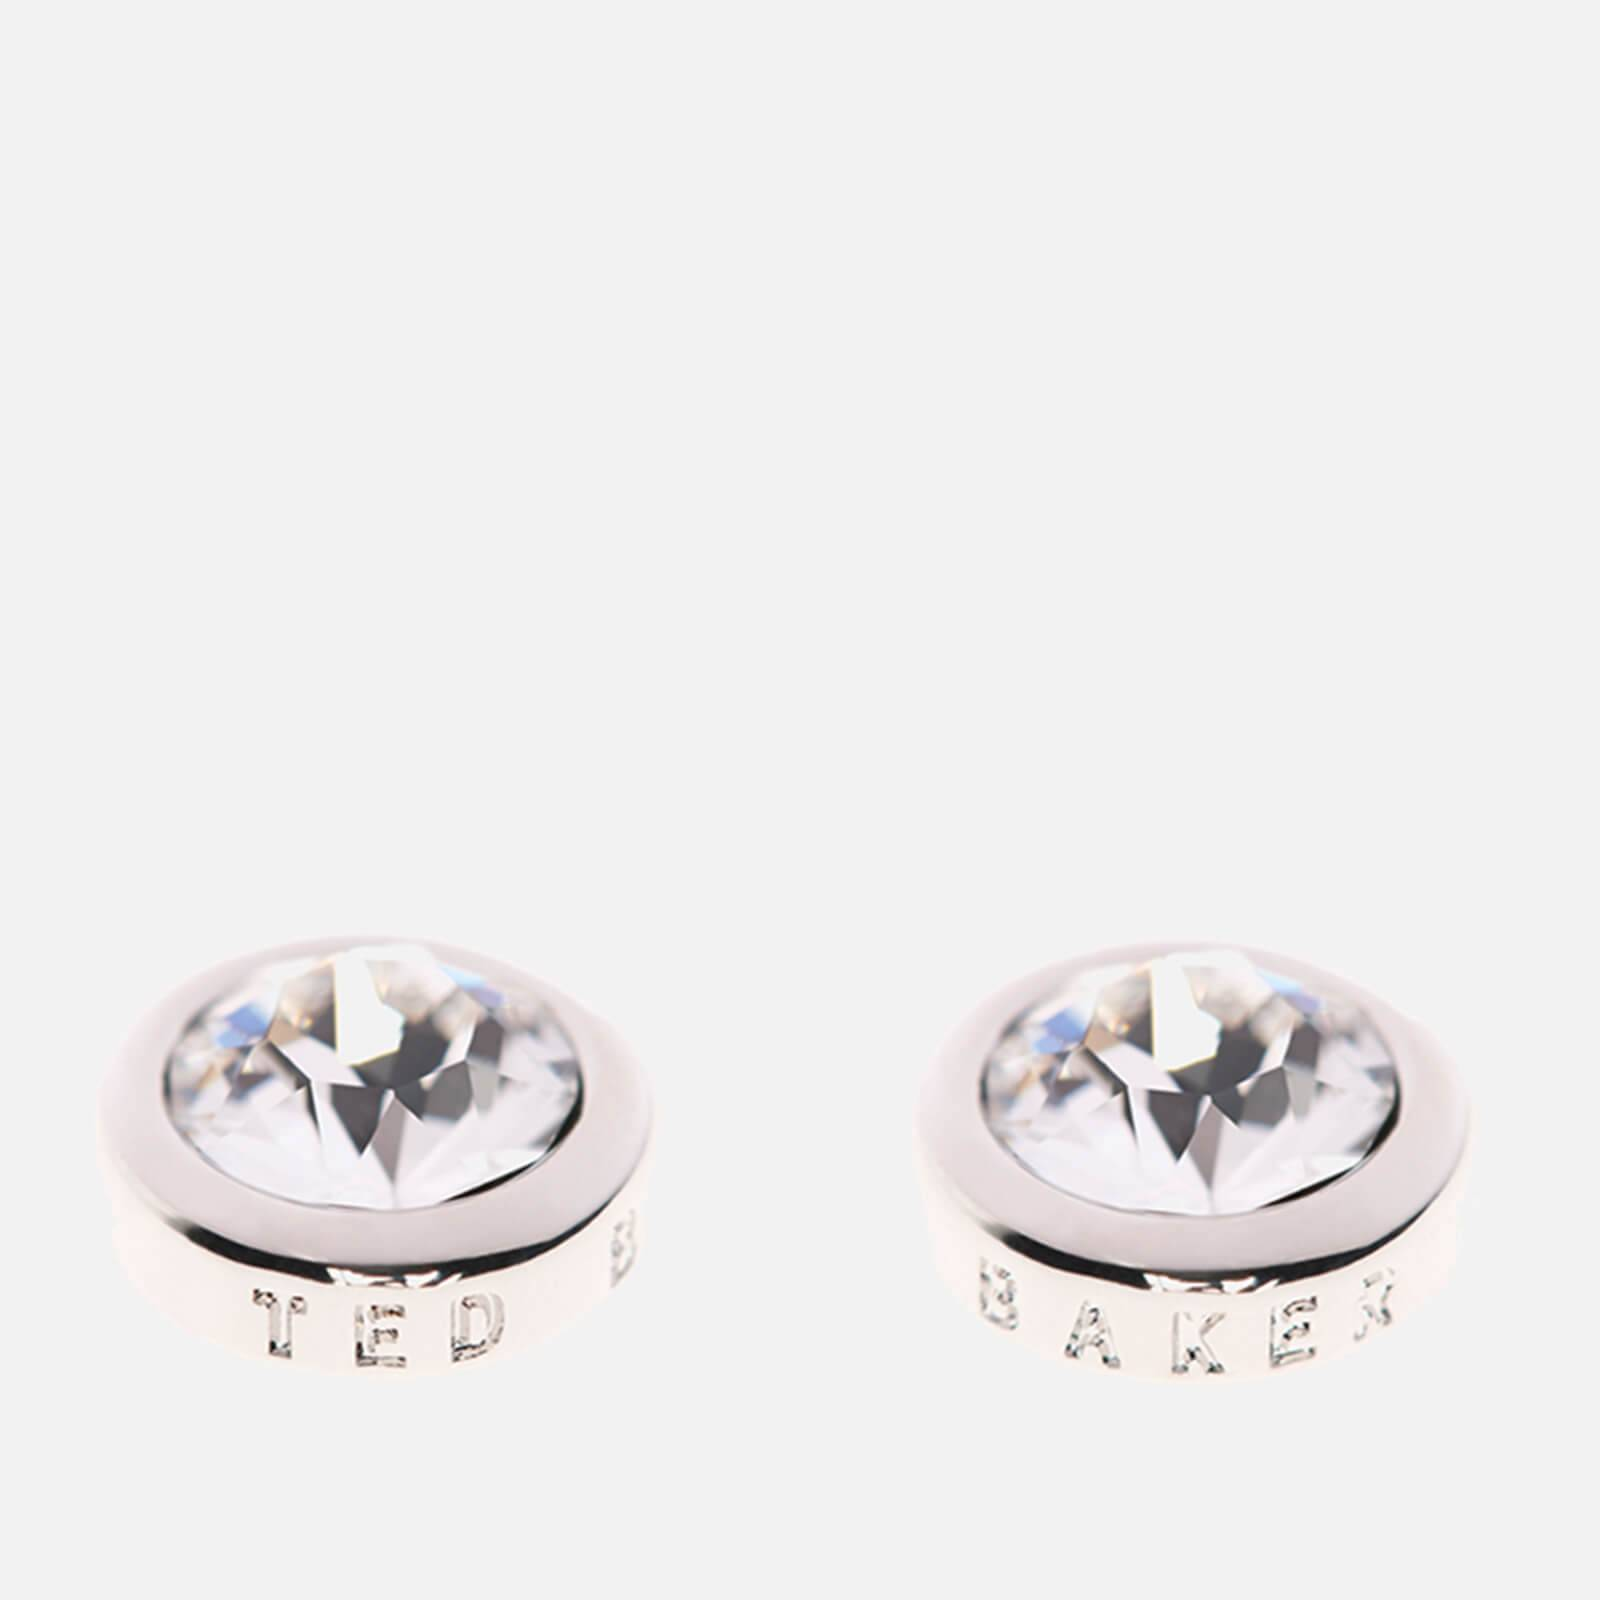 Ted Baker Women's Sinaa Swarovski Crystal Stud Earrings - Silver/Crystal - Rose Gold